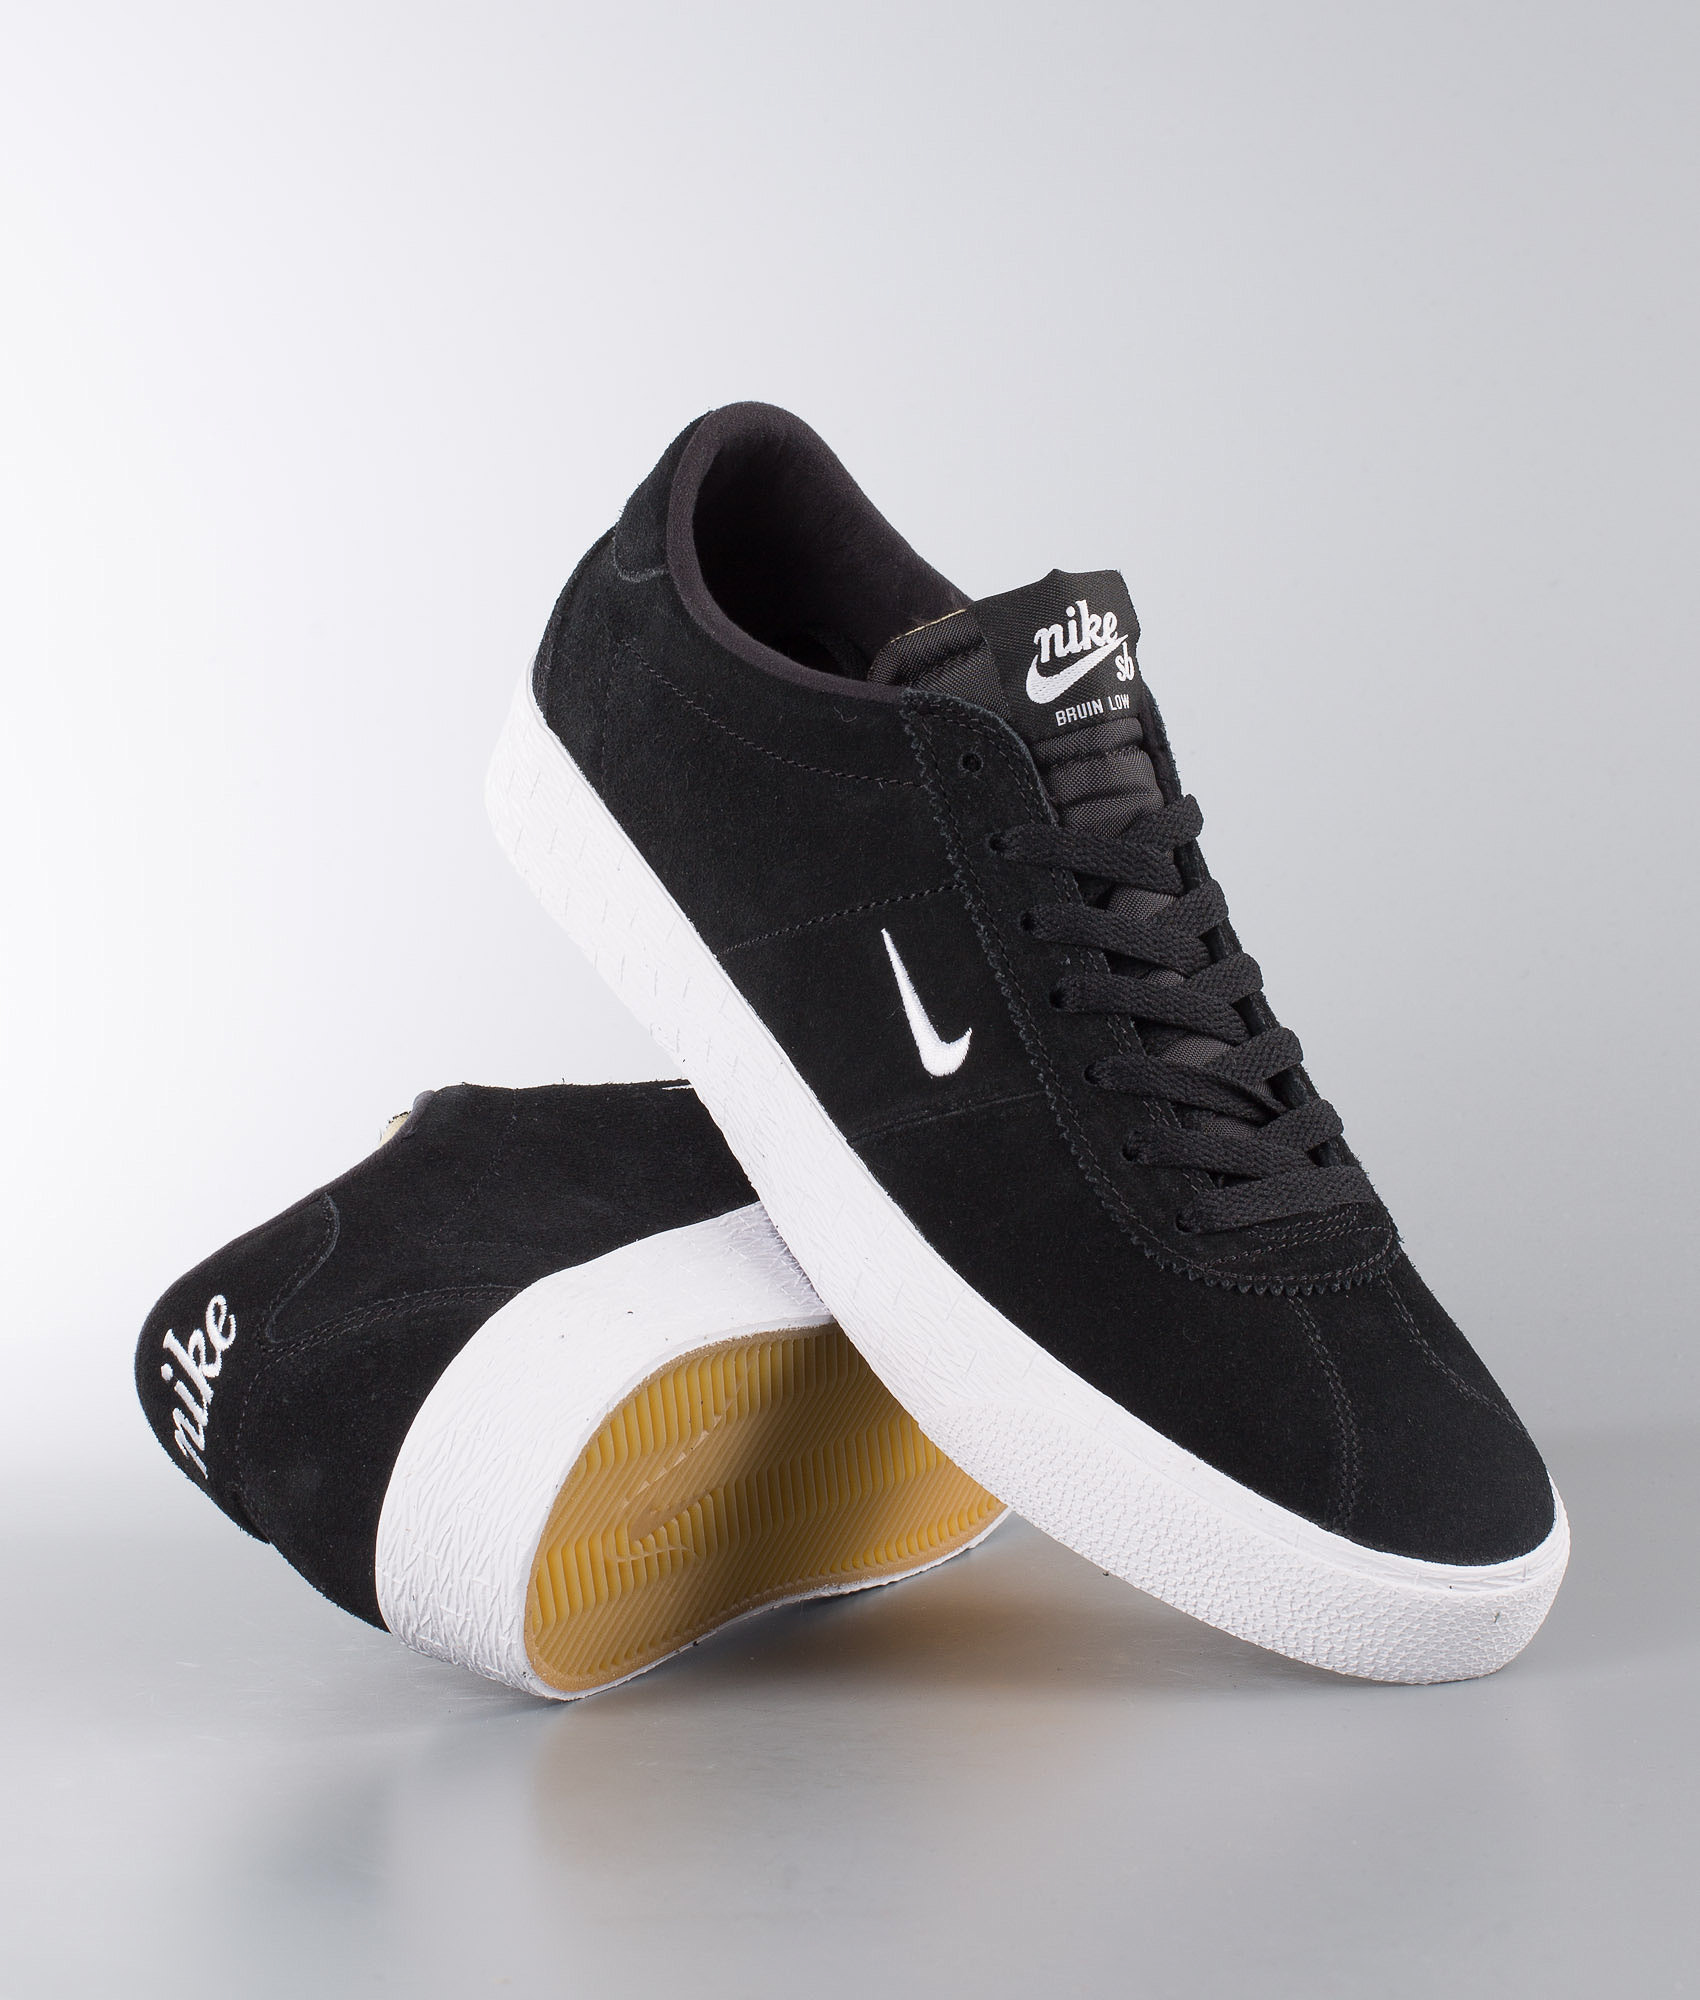 Nike Zoom Bruin Shoes Black White-Gum Light Brown - Ridestore.com 25ff5aa9b47b